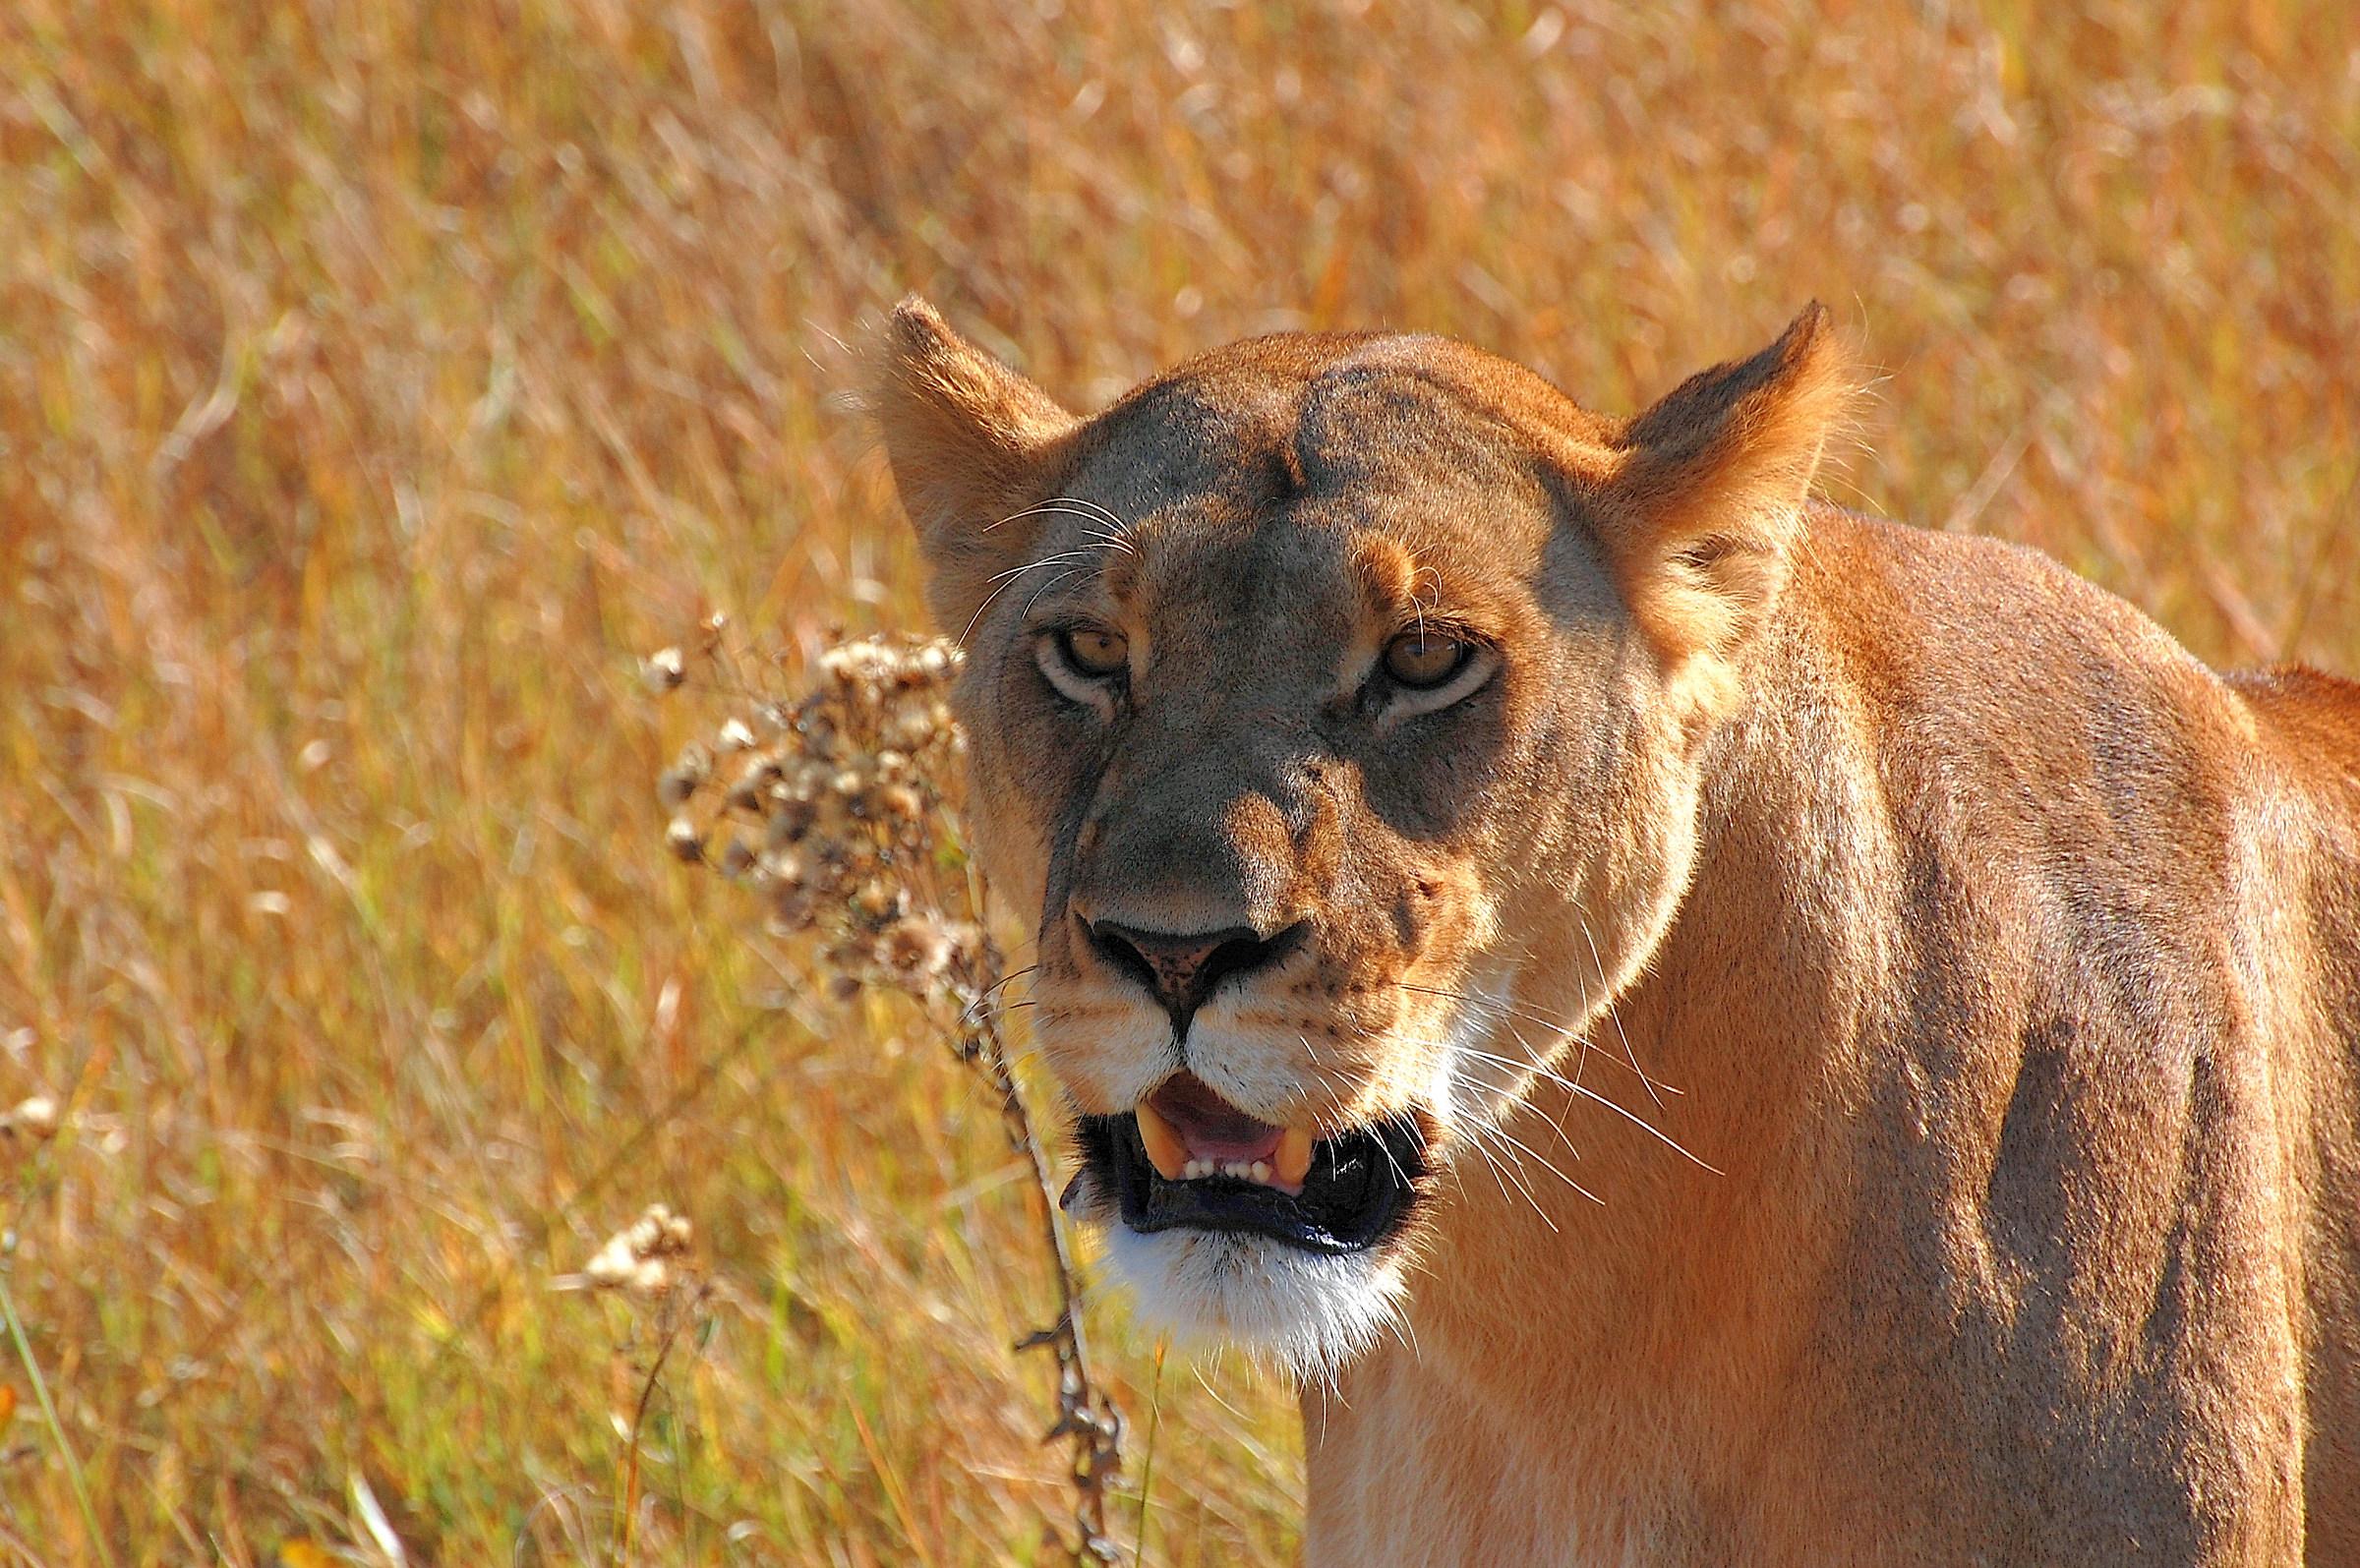 Botswana-Moremi Park: Smile...